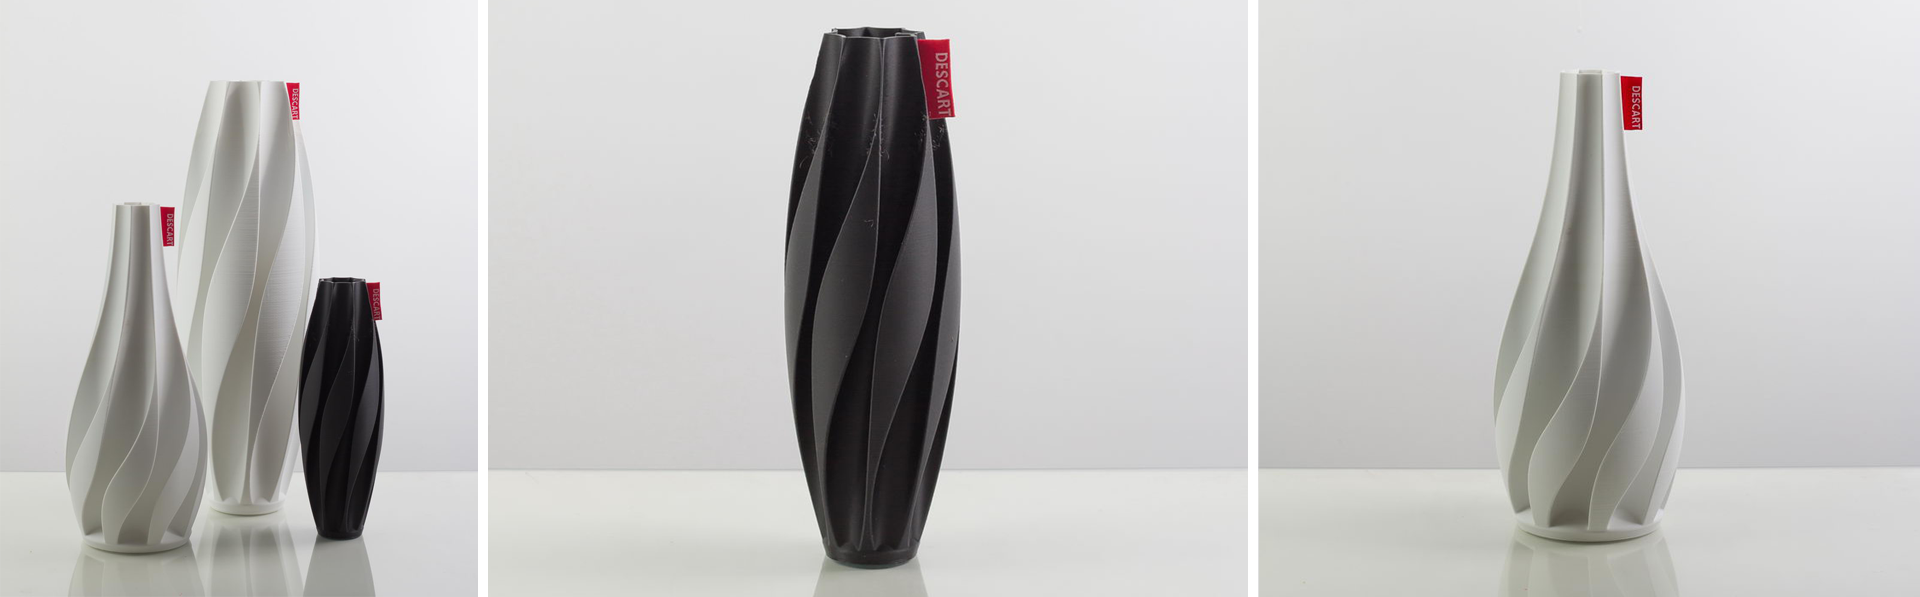 3d print-service-design büro-mainz-loew design